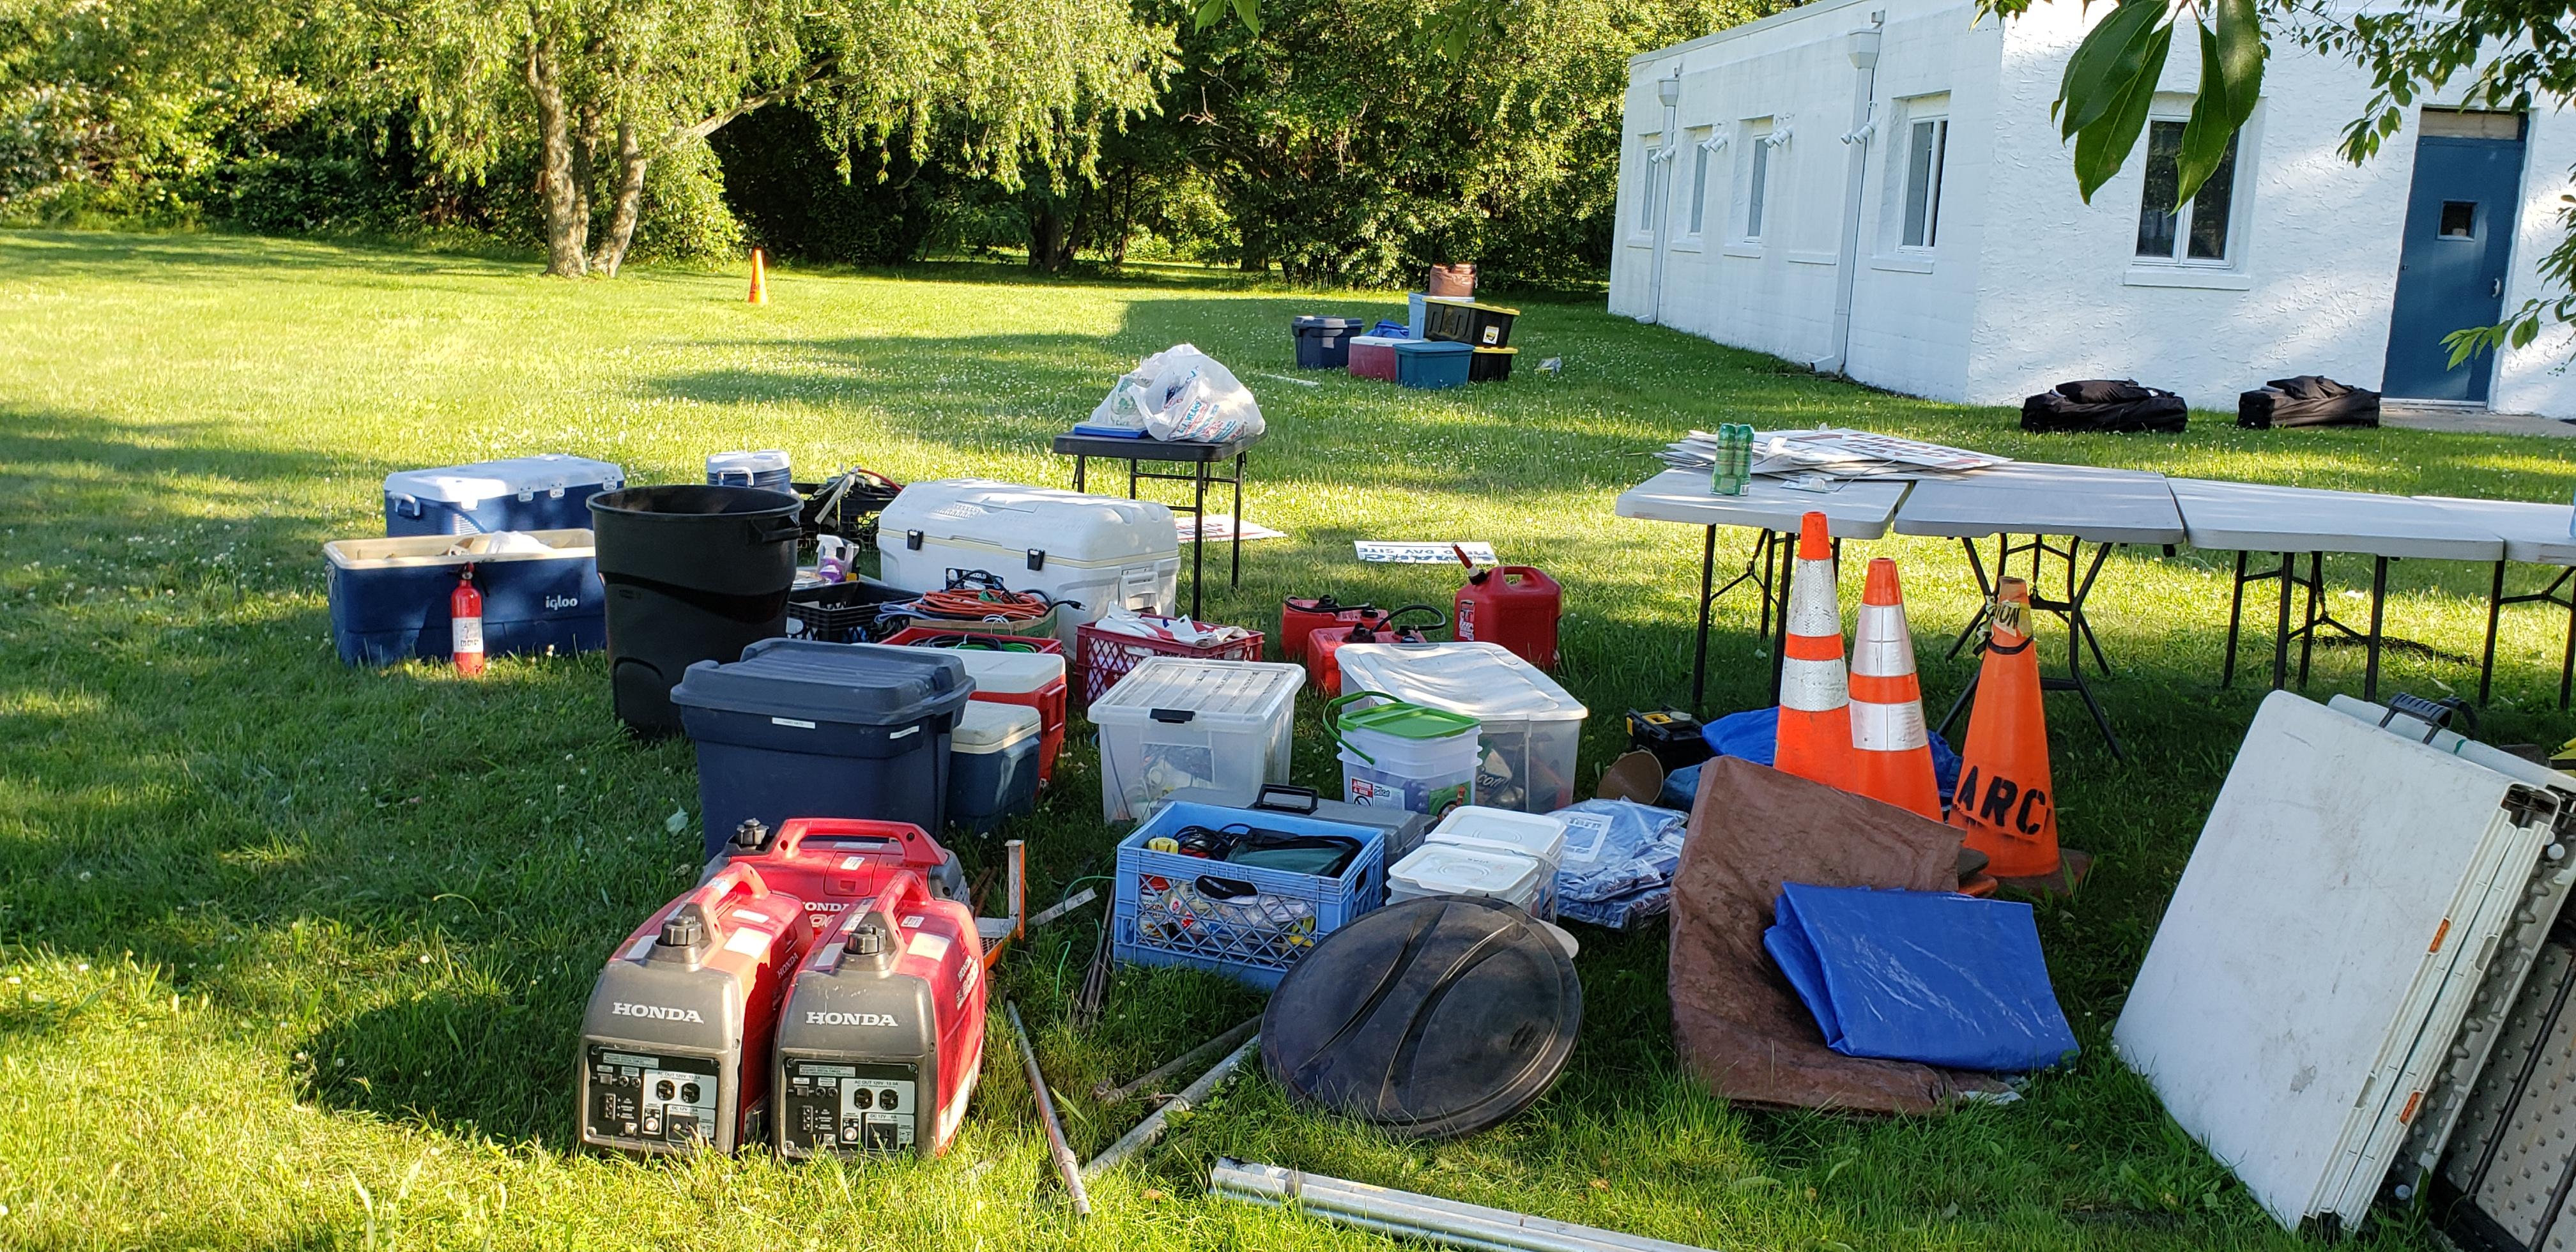 Truck-unloaded-ready-for-setup